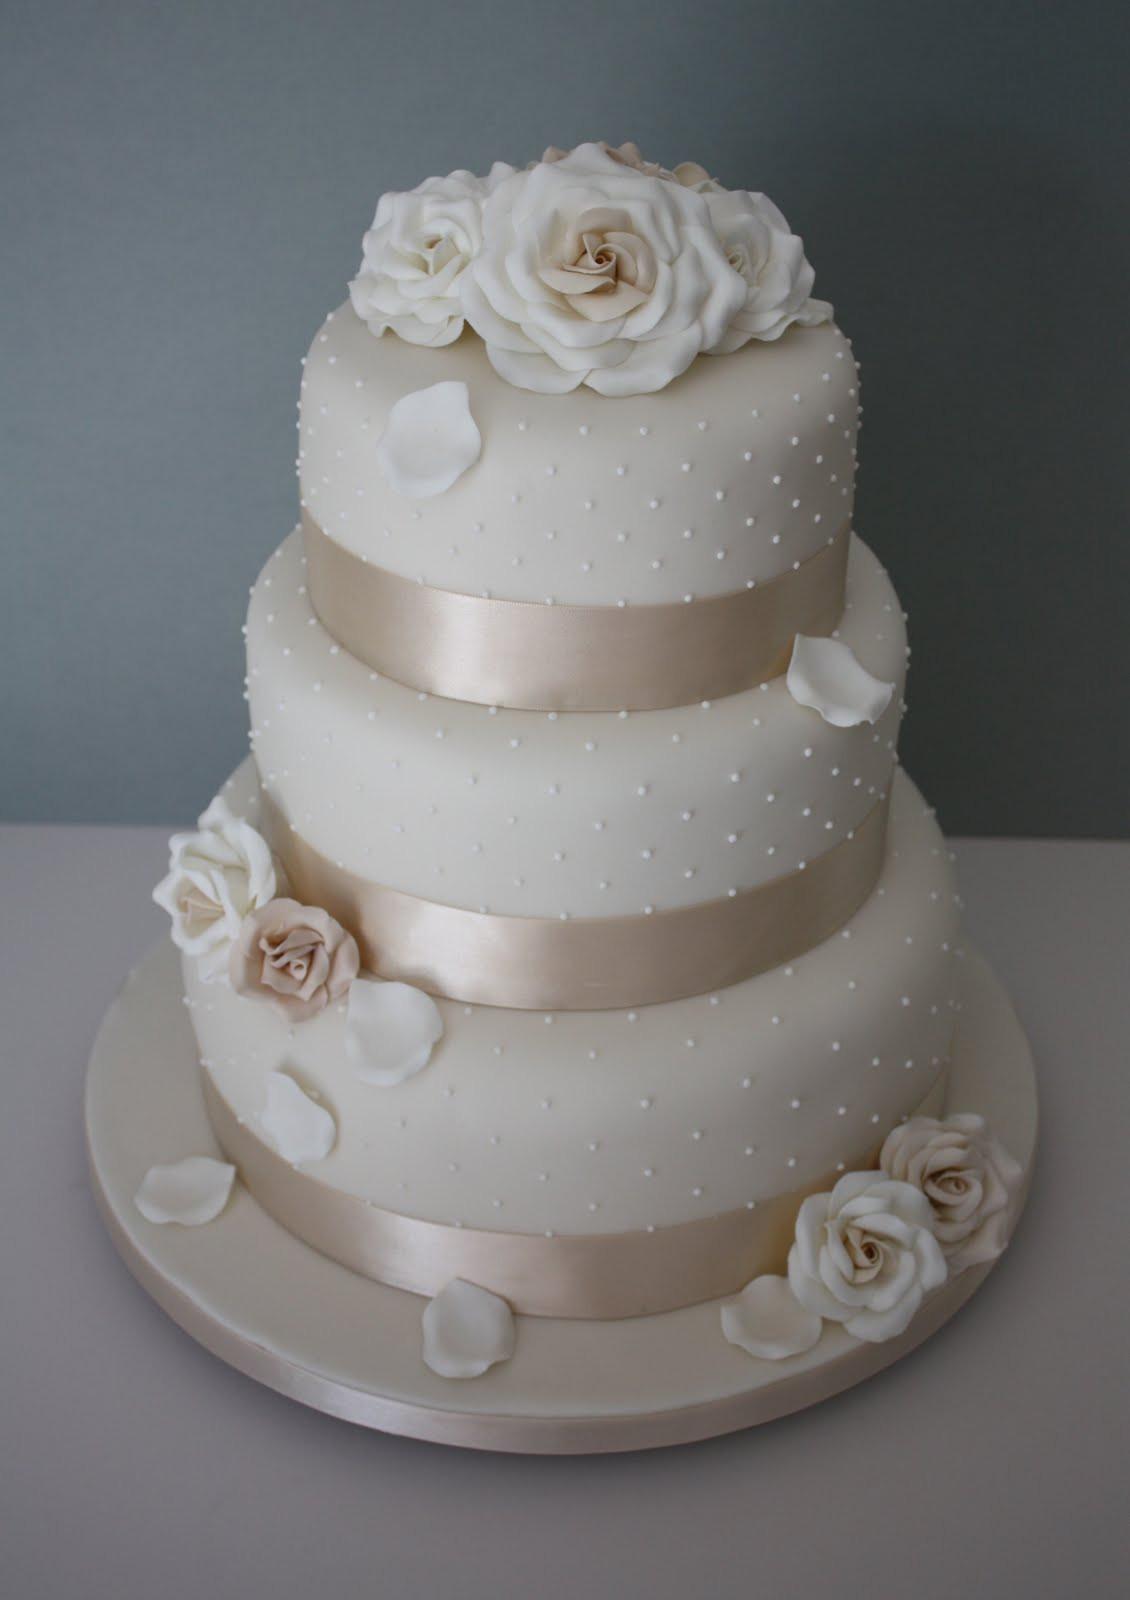 3 Tier Wedding Cakes Designs  Tiers & Tiaras Allt yr ynys Roses and Dots Wedding Cake